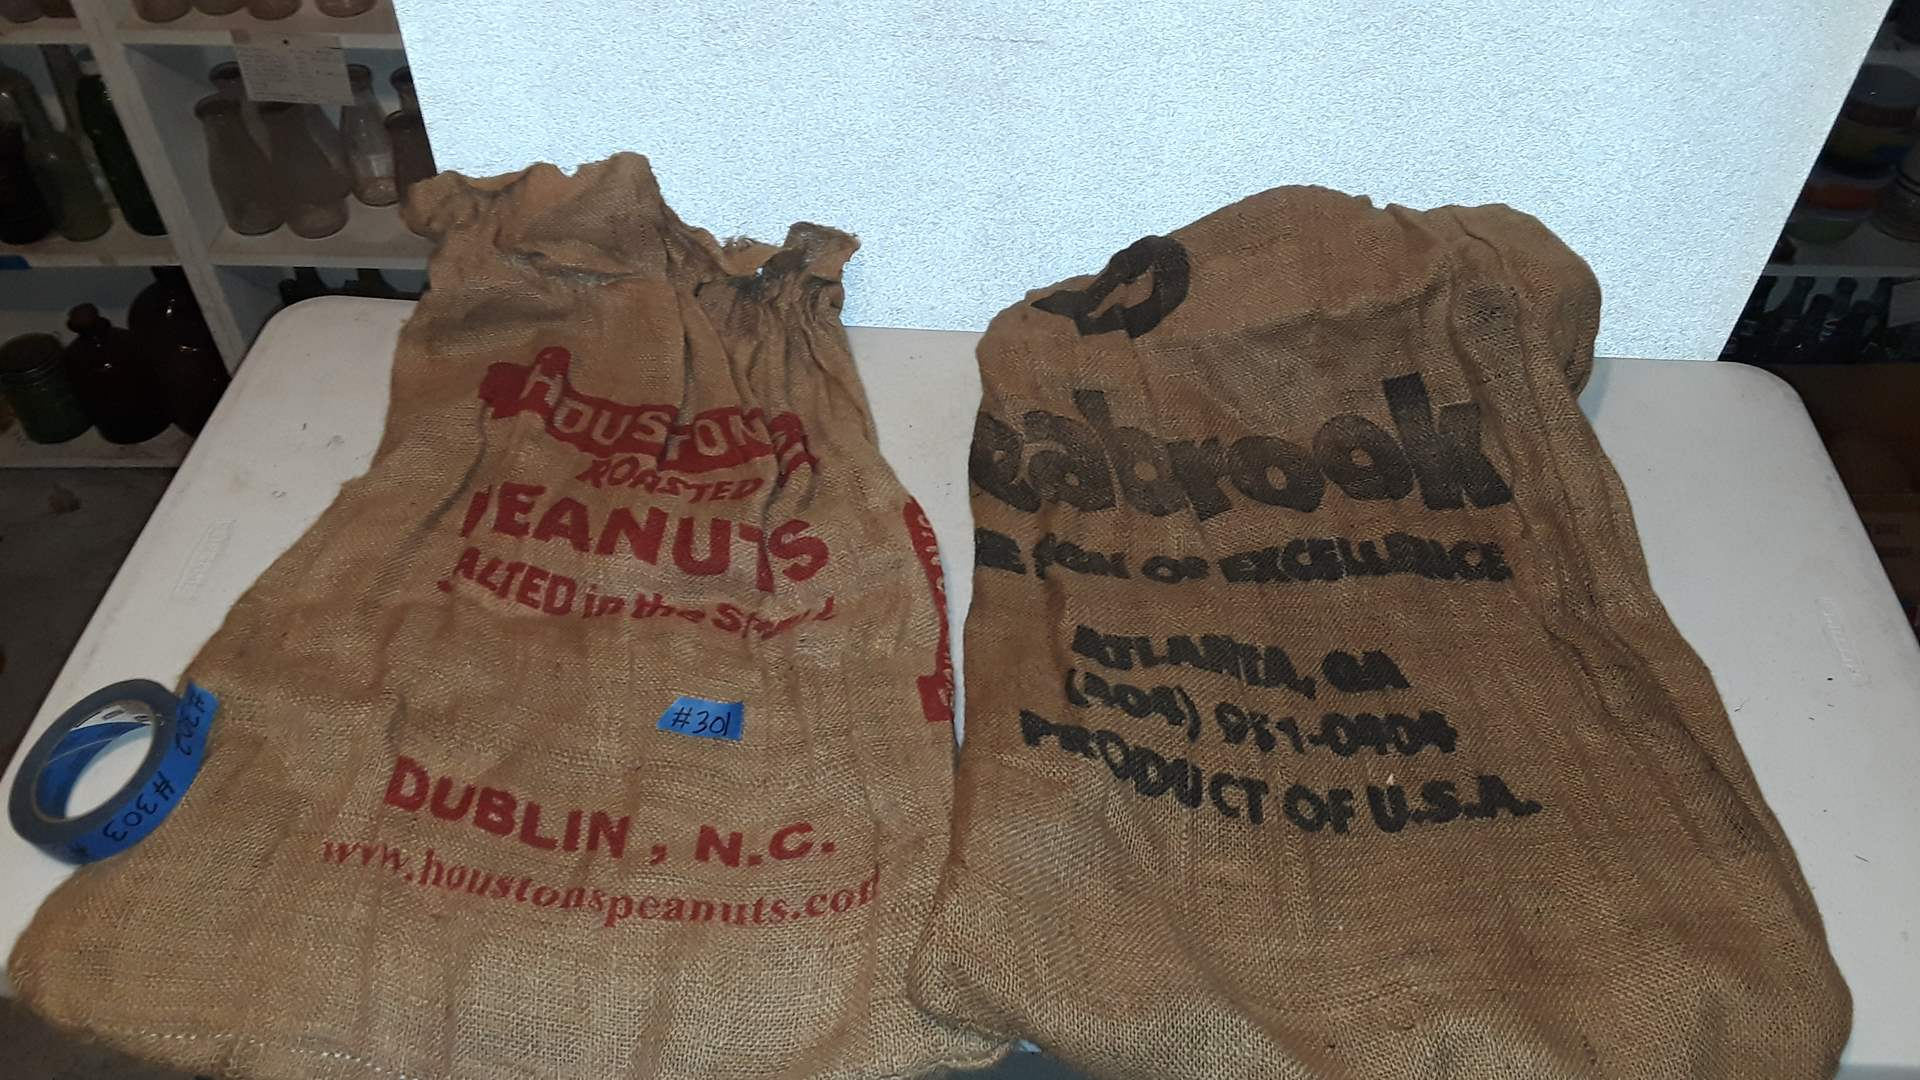 Lot # 301 HOUSTON'S ROASTED PEANUTS , DUBLIN, NC BURLAP SACK AND SEABROOK,  ATLANTA GA